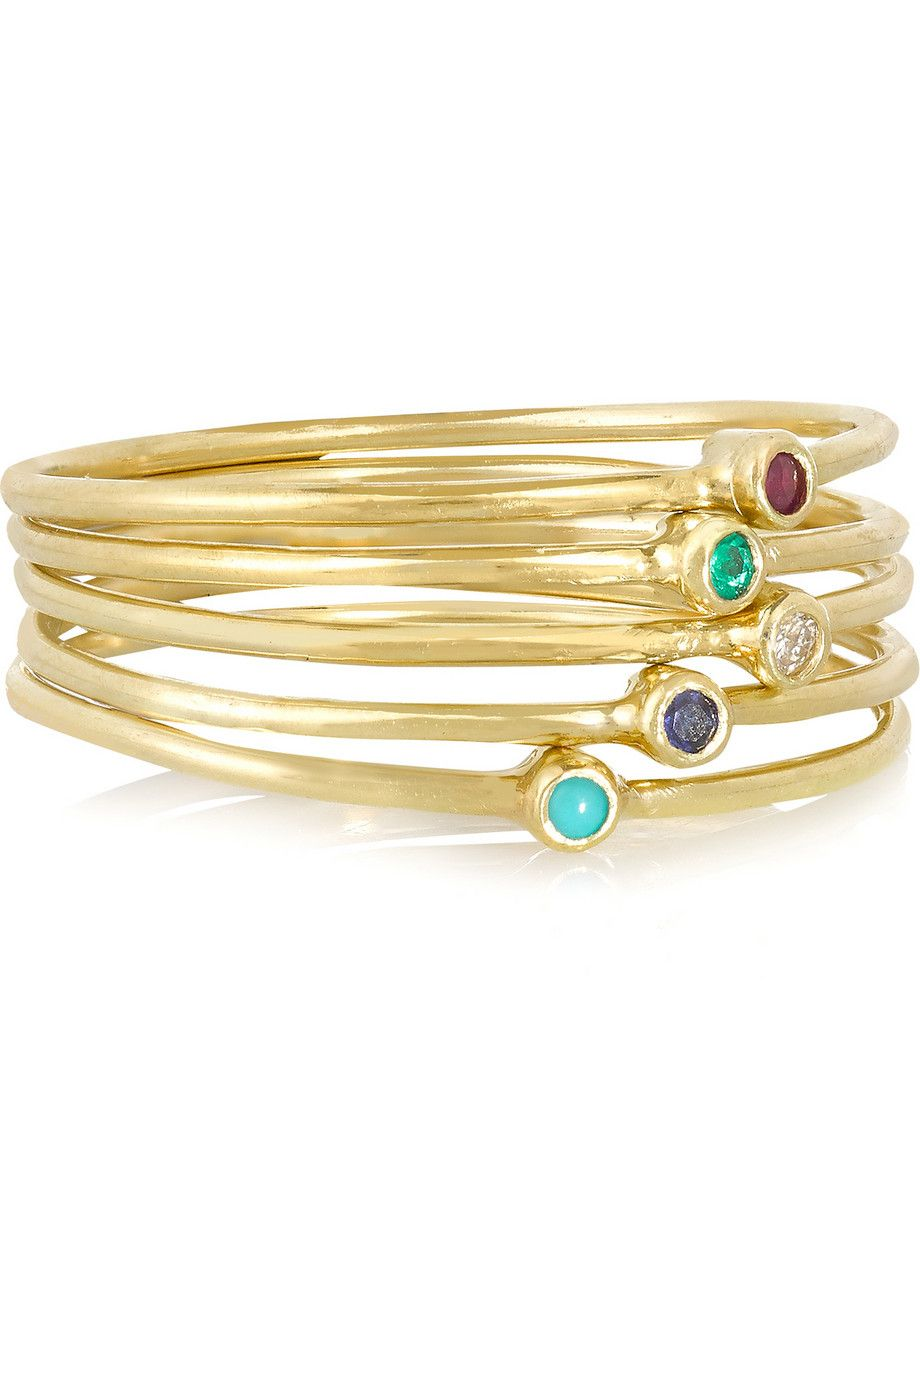 Jennifer Meyer 18-karat Gold Multi-stone Ring ApmRq9ju7P